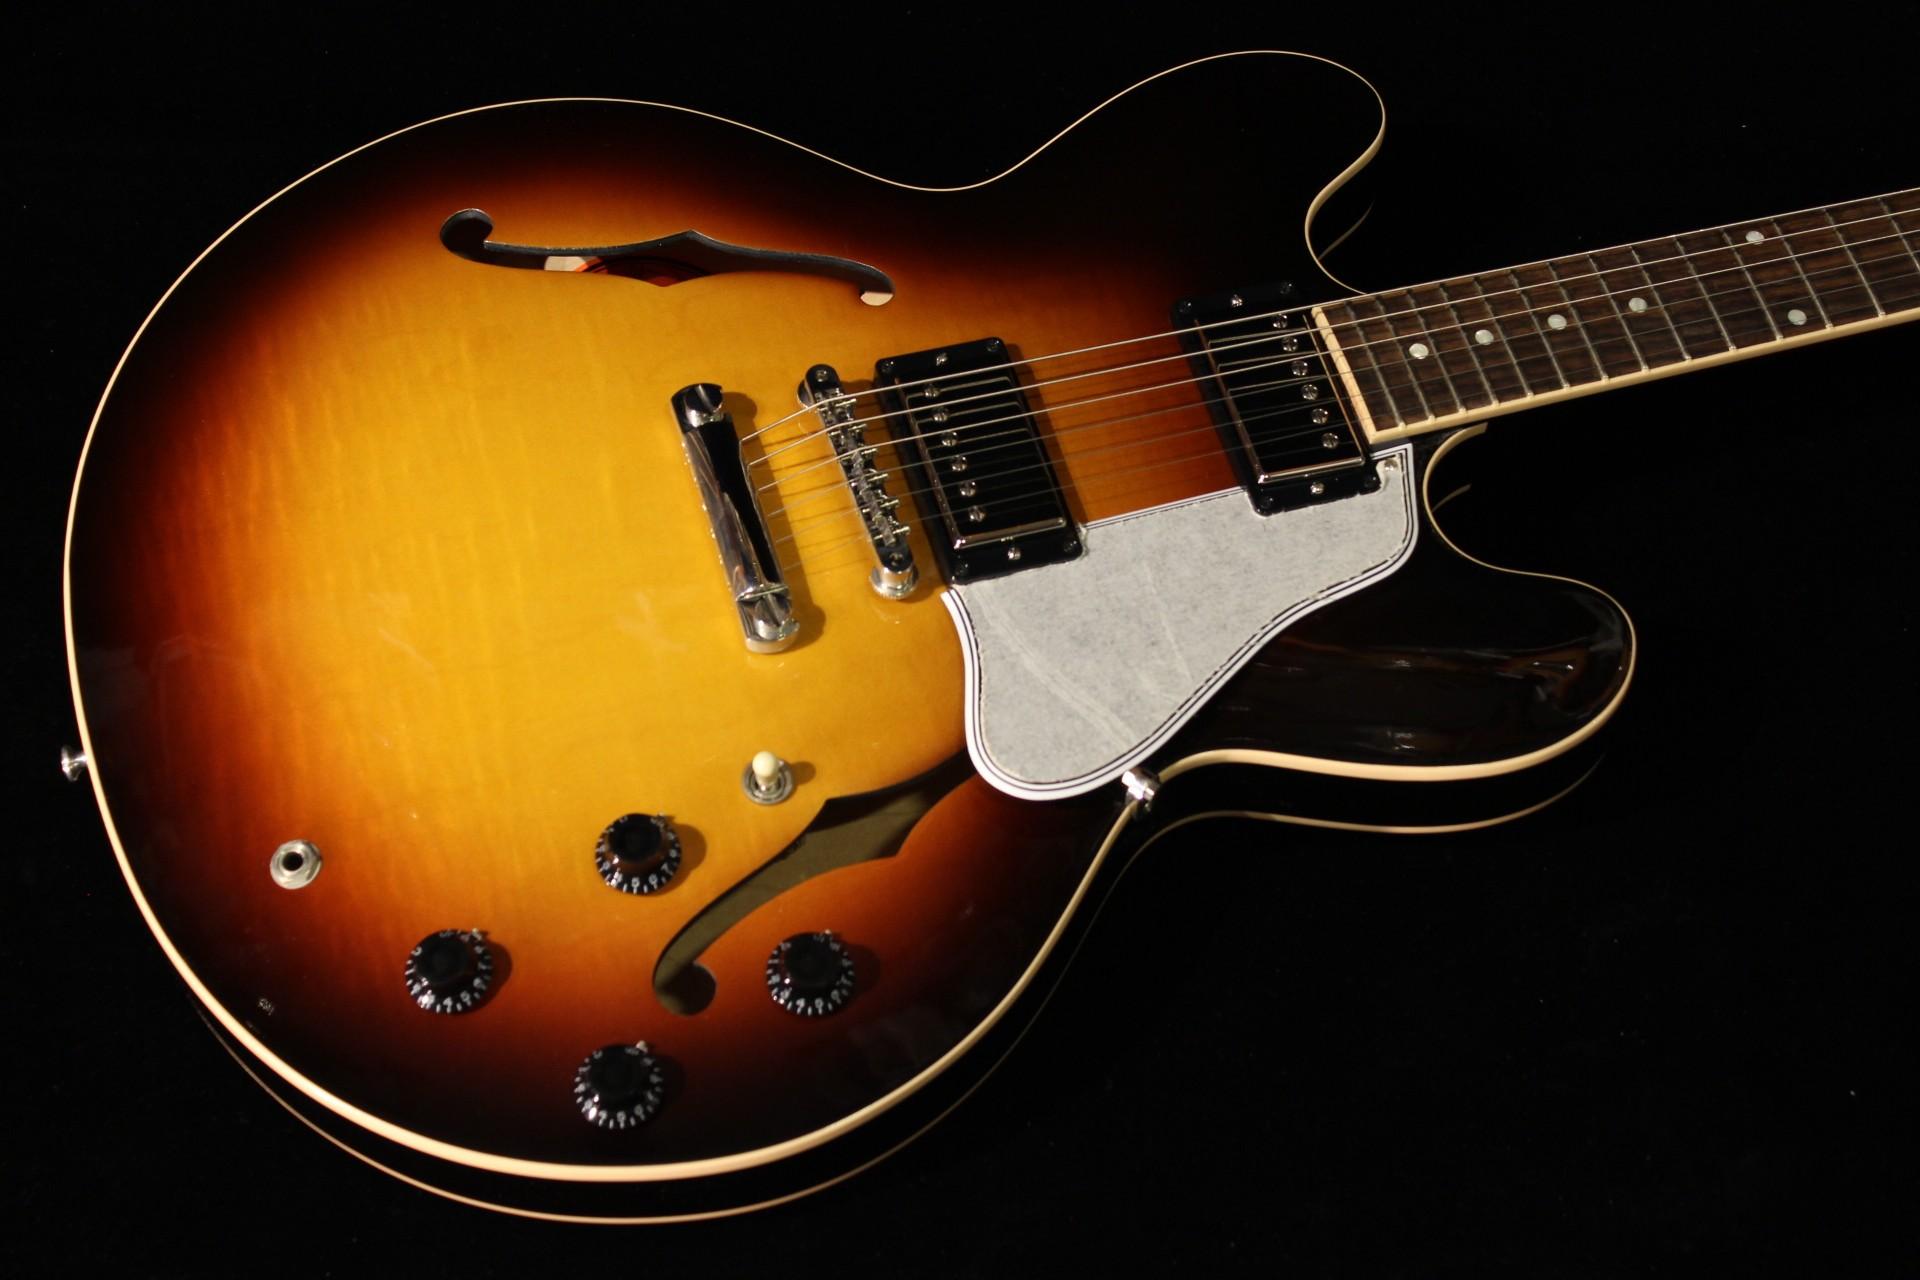 gibson memphis es 335 dot figured triburst sn 11212703 gino guitars. Black Bedroom Furniture Sets. Home Design Ideas